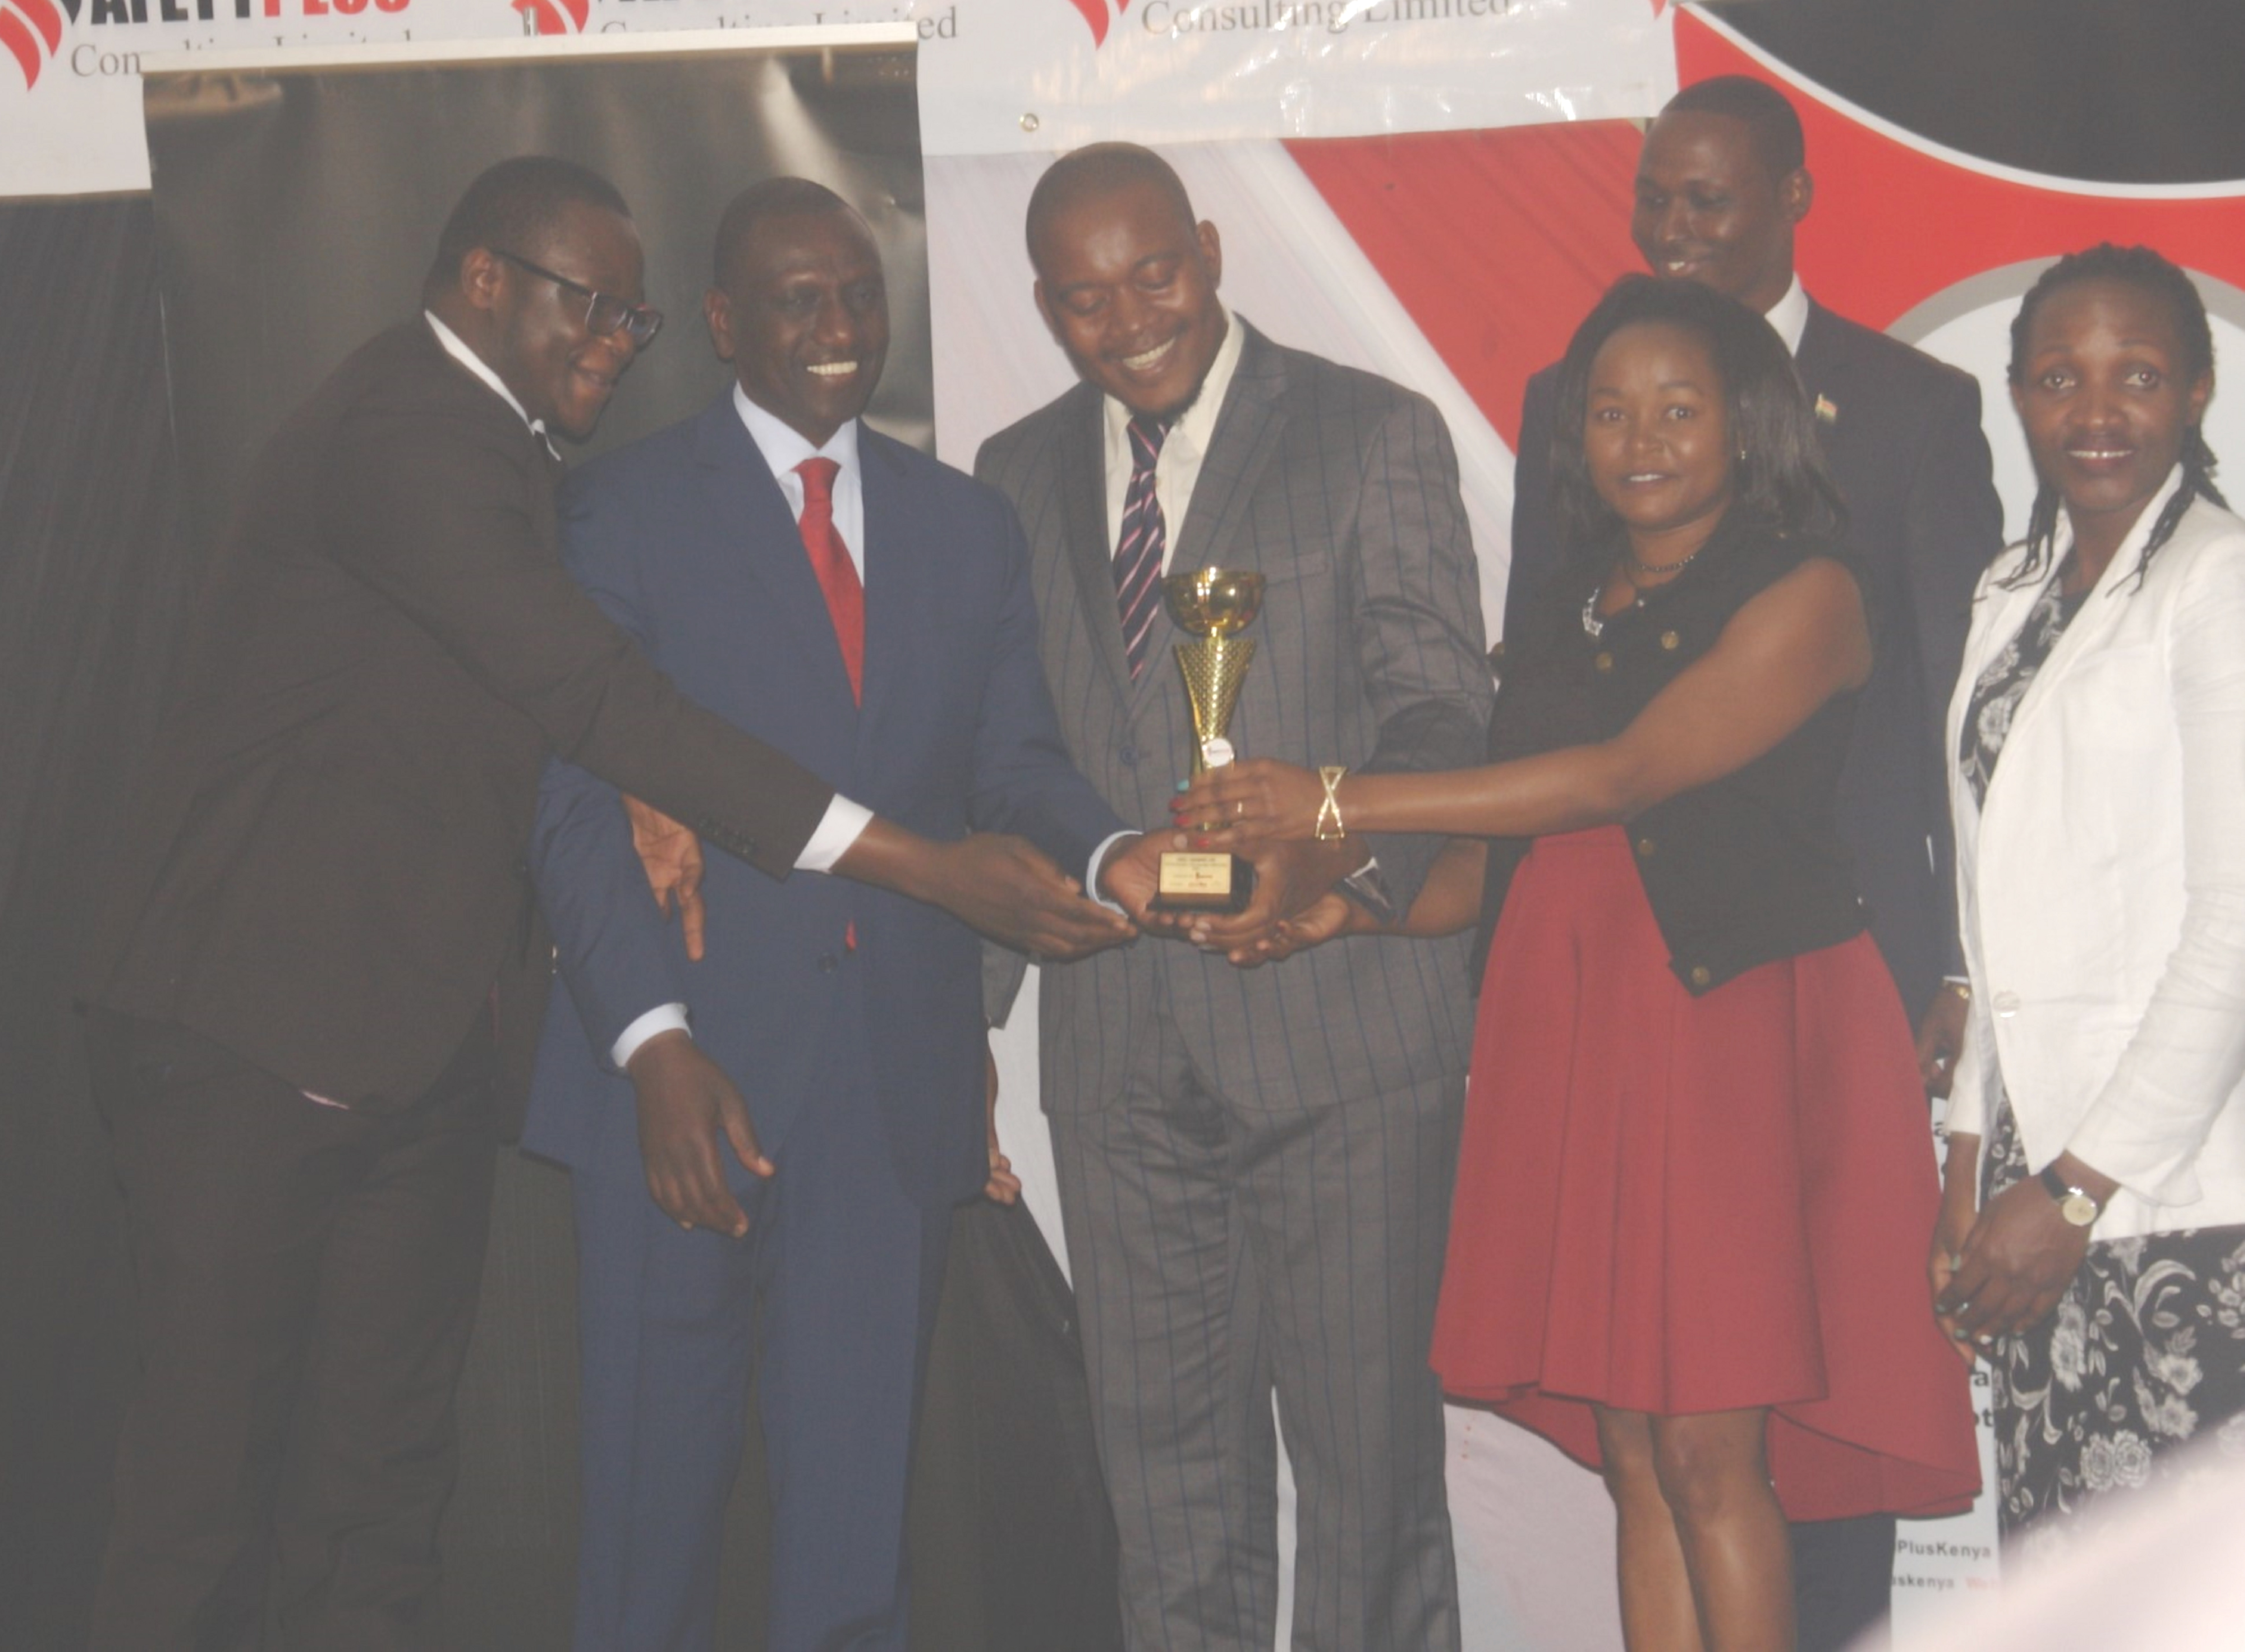 Ruto VAELL Safety Awards (1)